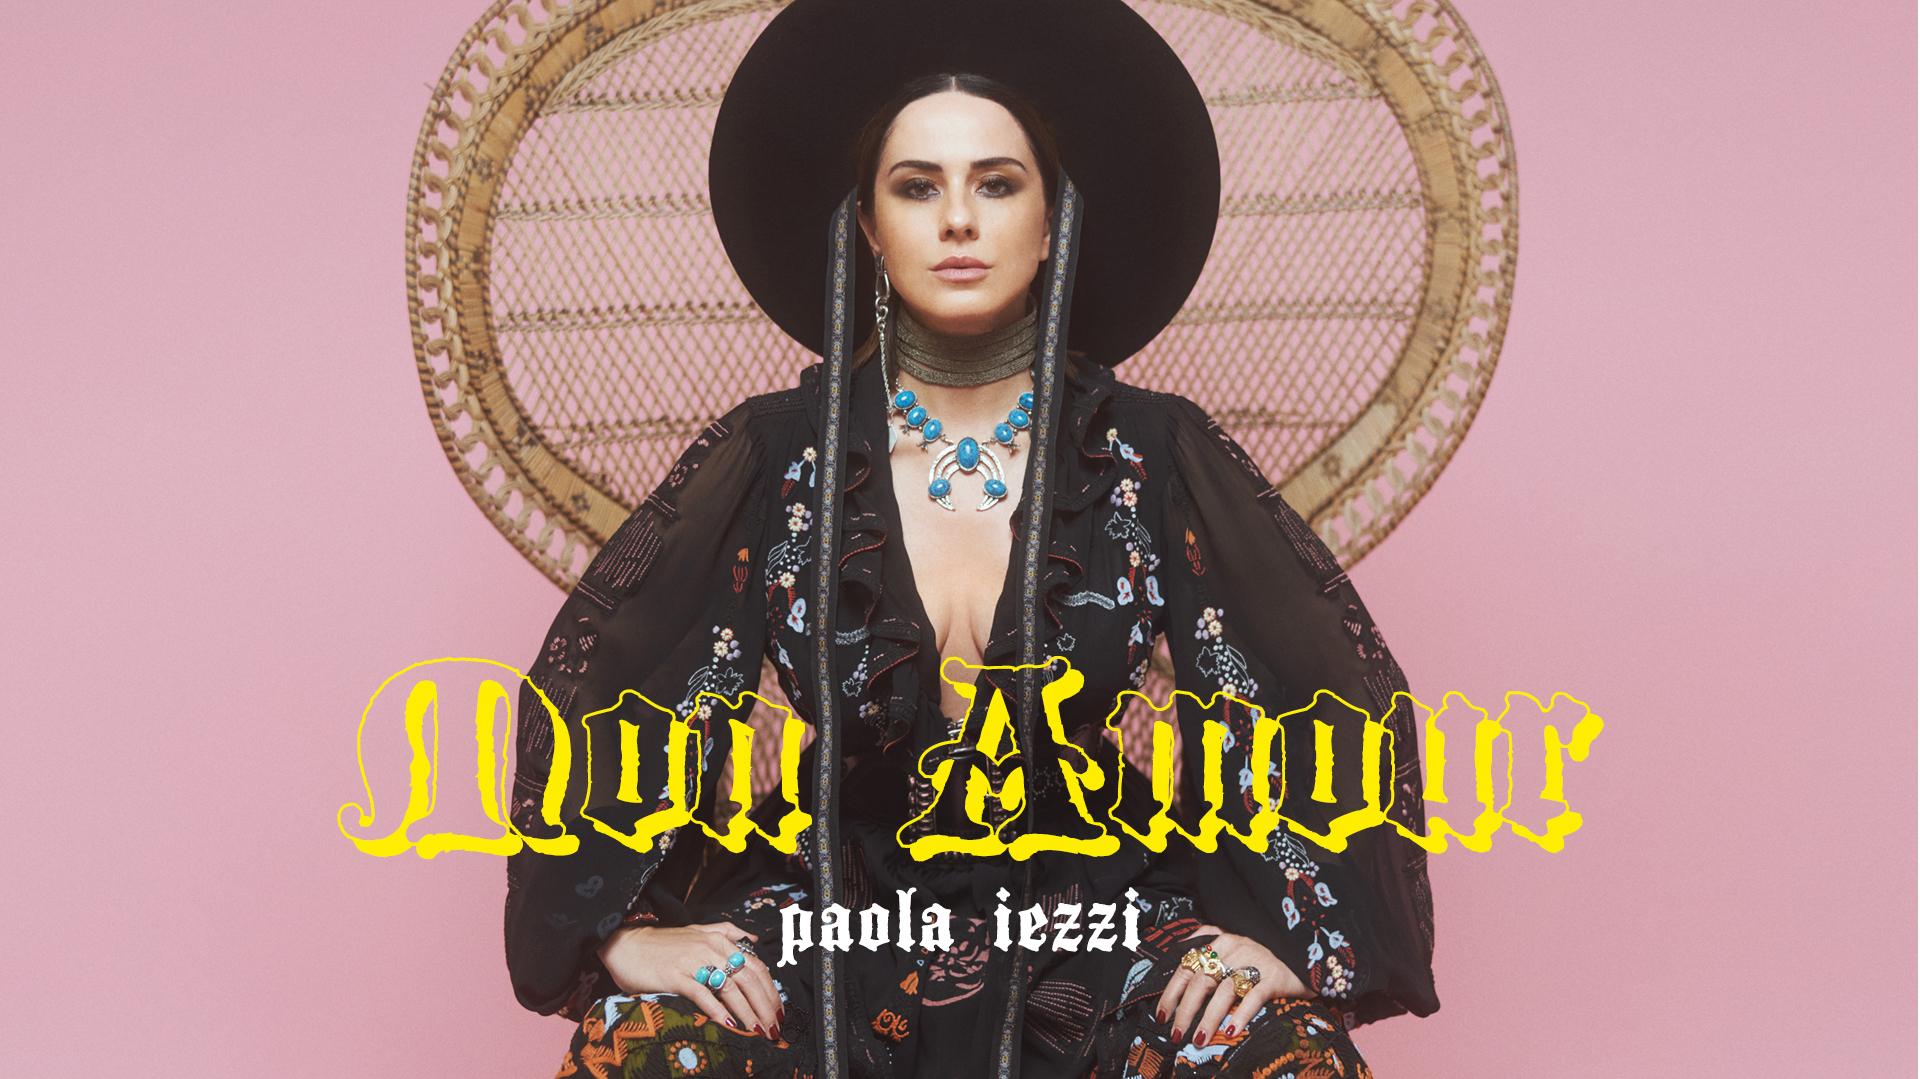 Paola Iezzi Fan Club